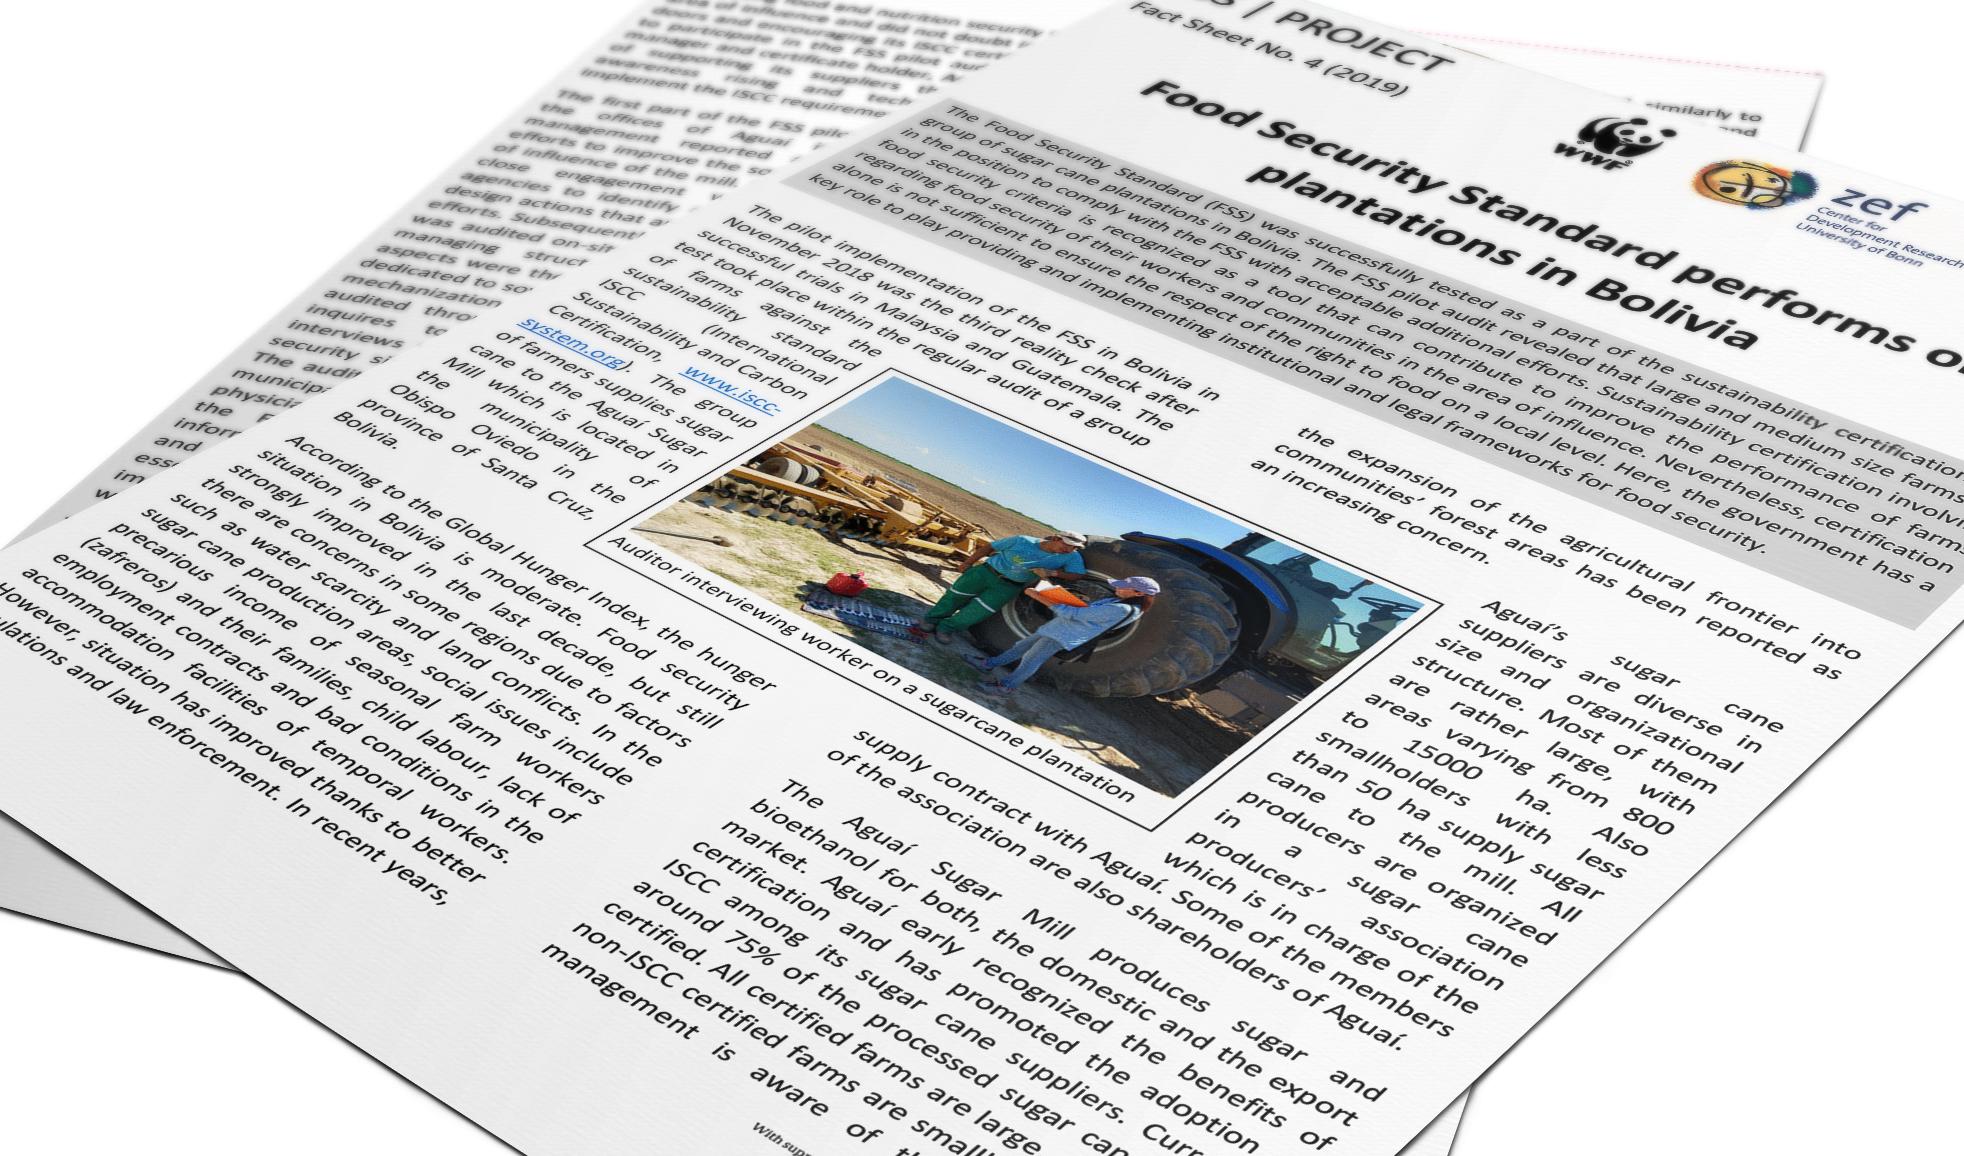 2019-factsheet-fss-in-bolivia-teaserpicture